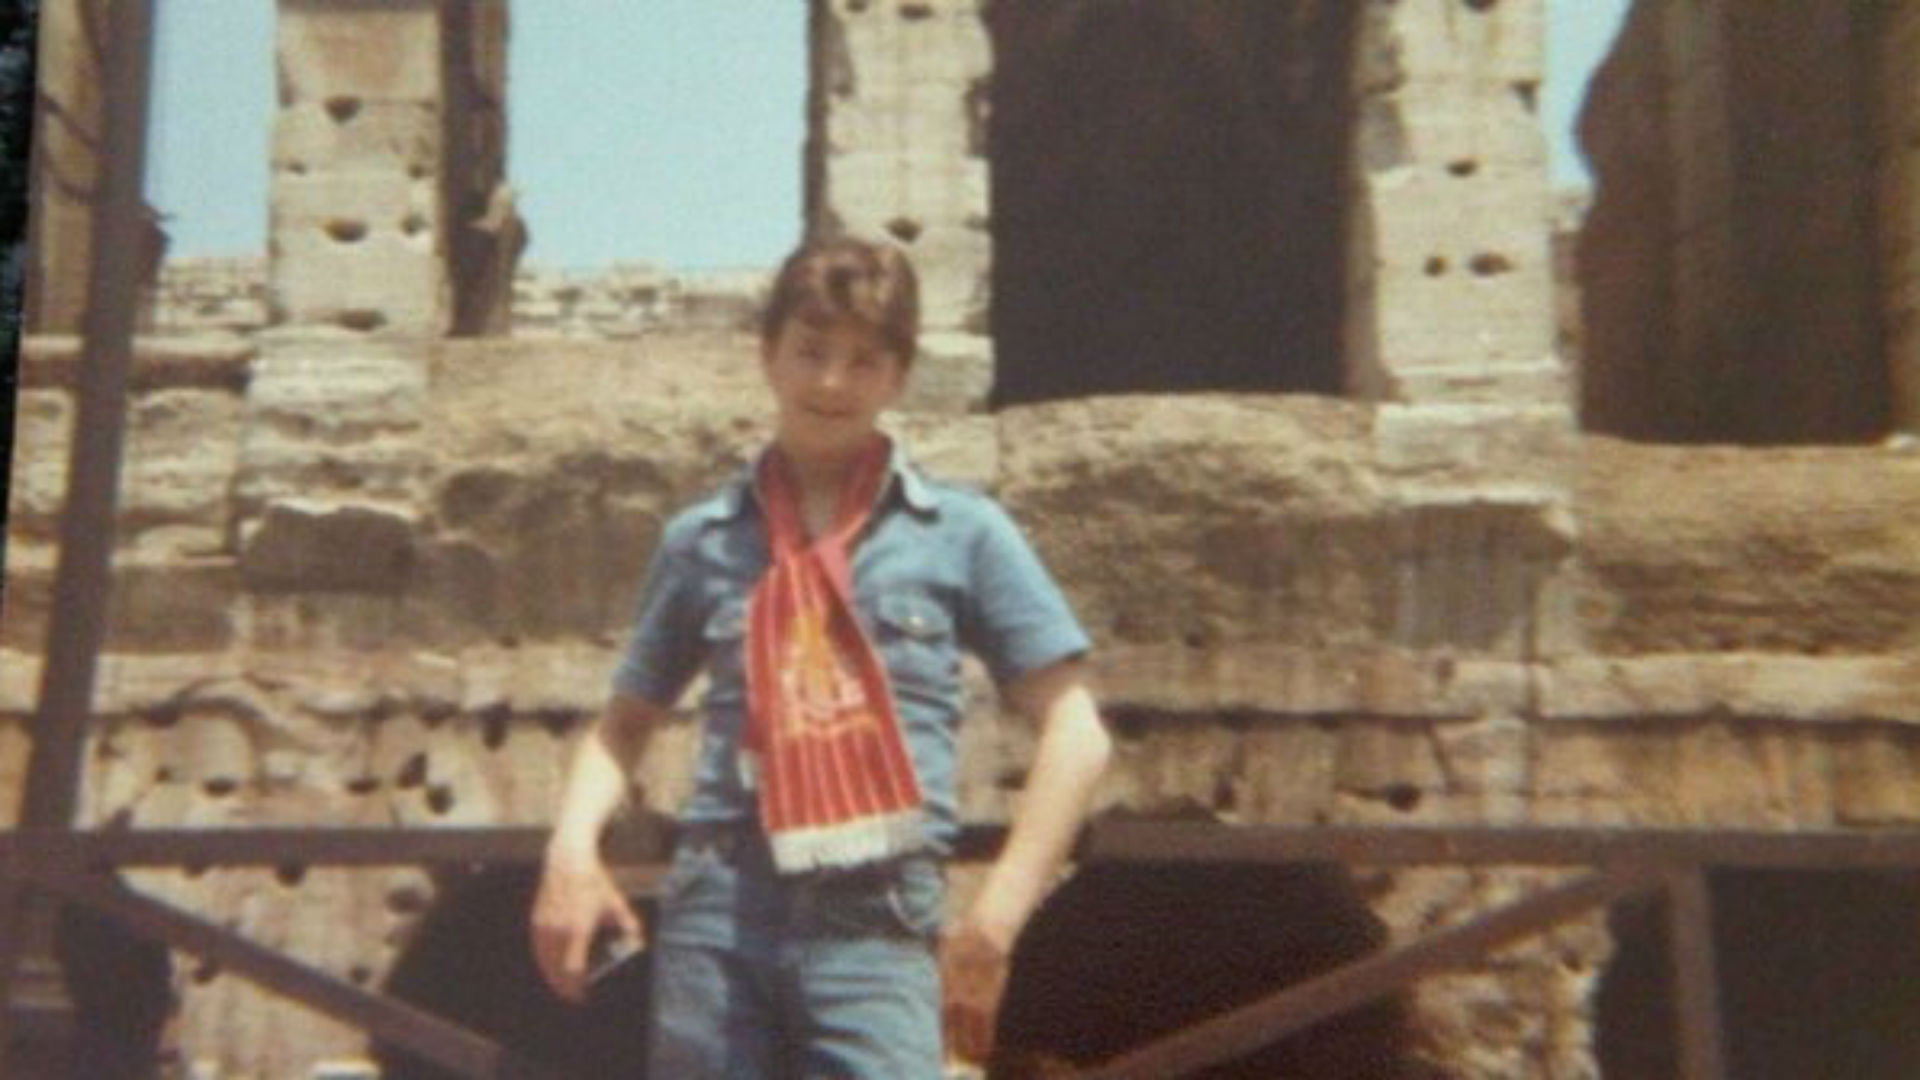 Liverpool fan Stephen Monaghan in Rome, 1977